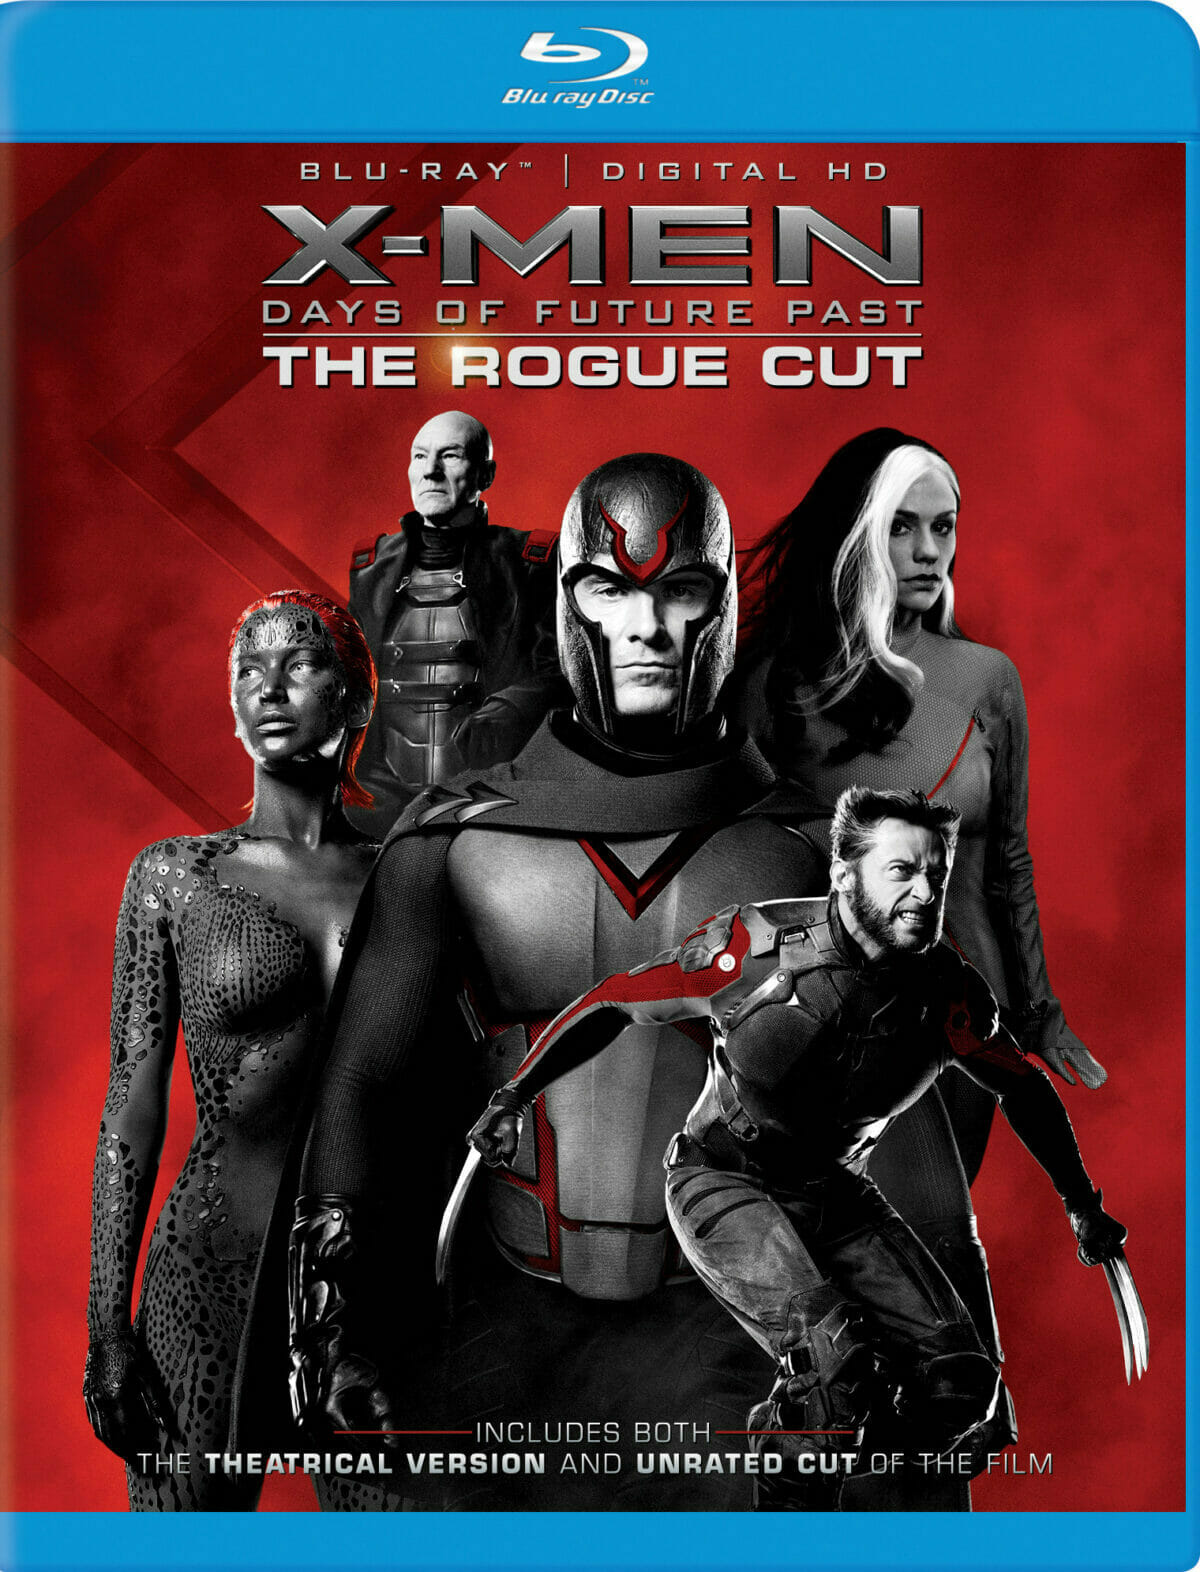 The-Rogue-Cut